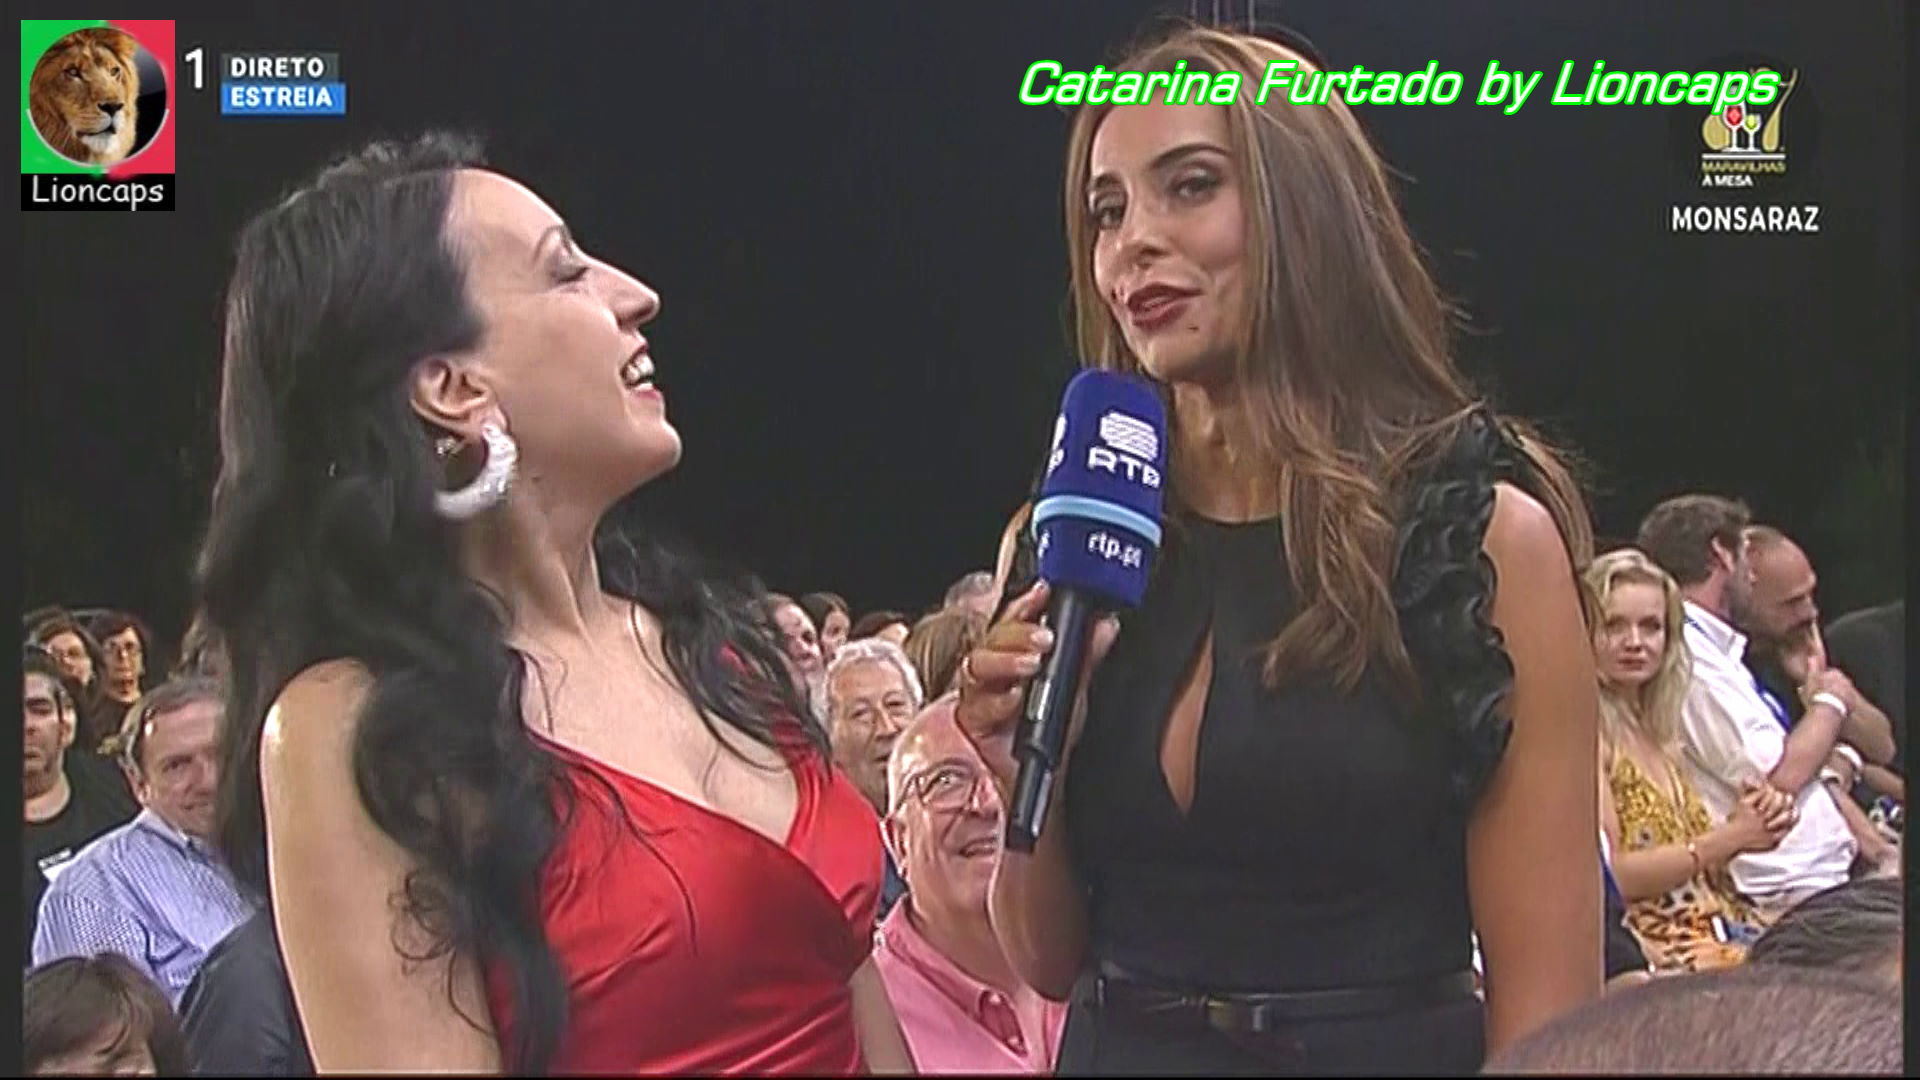 443733433_catarina_furtado_rtp_vs180805_0094_122_107lo.JPG